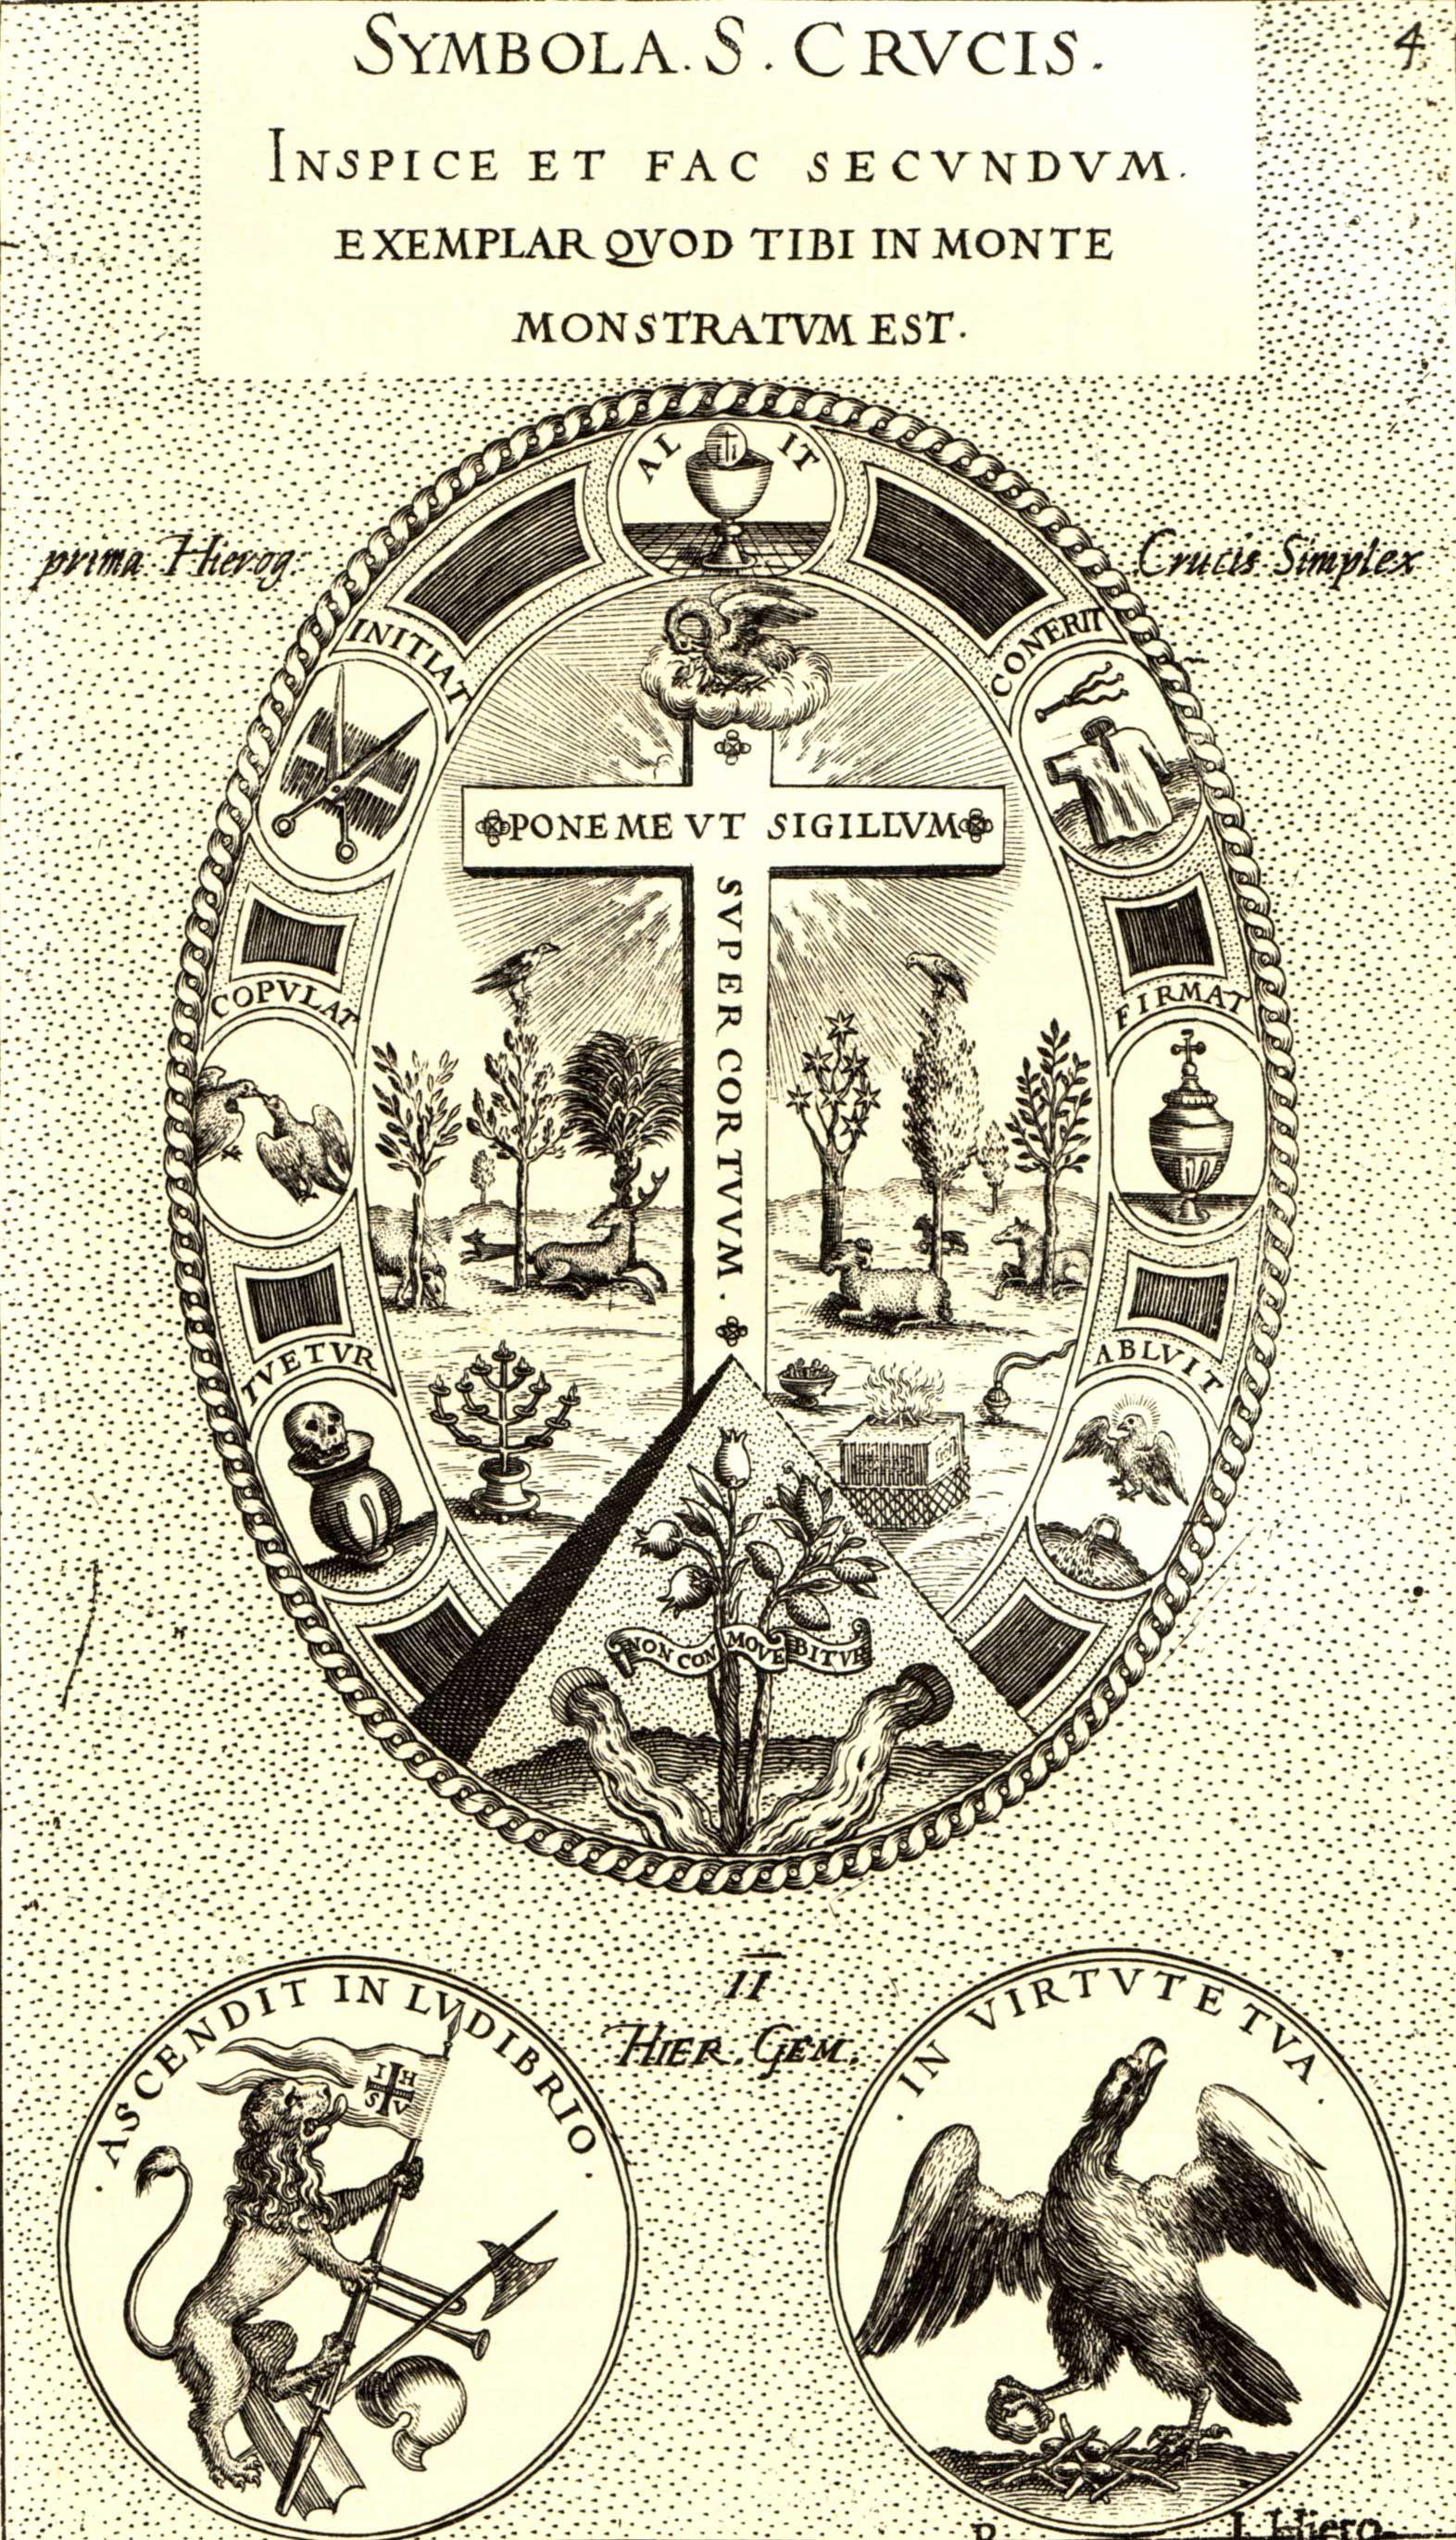 Http Www Spamula Net Blog I36 Typotius1 Jpg оккультизм картины магия